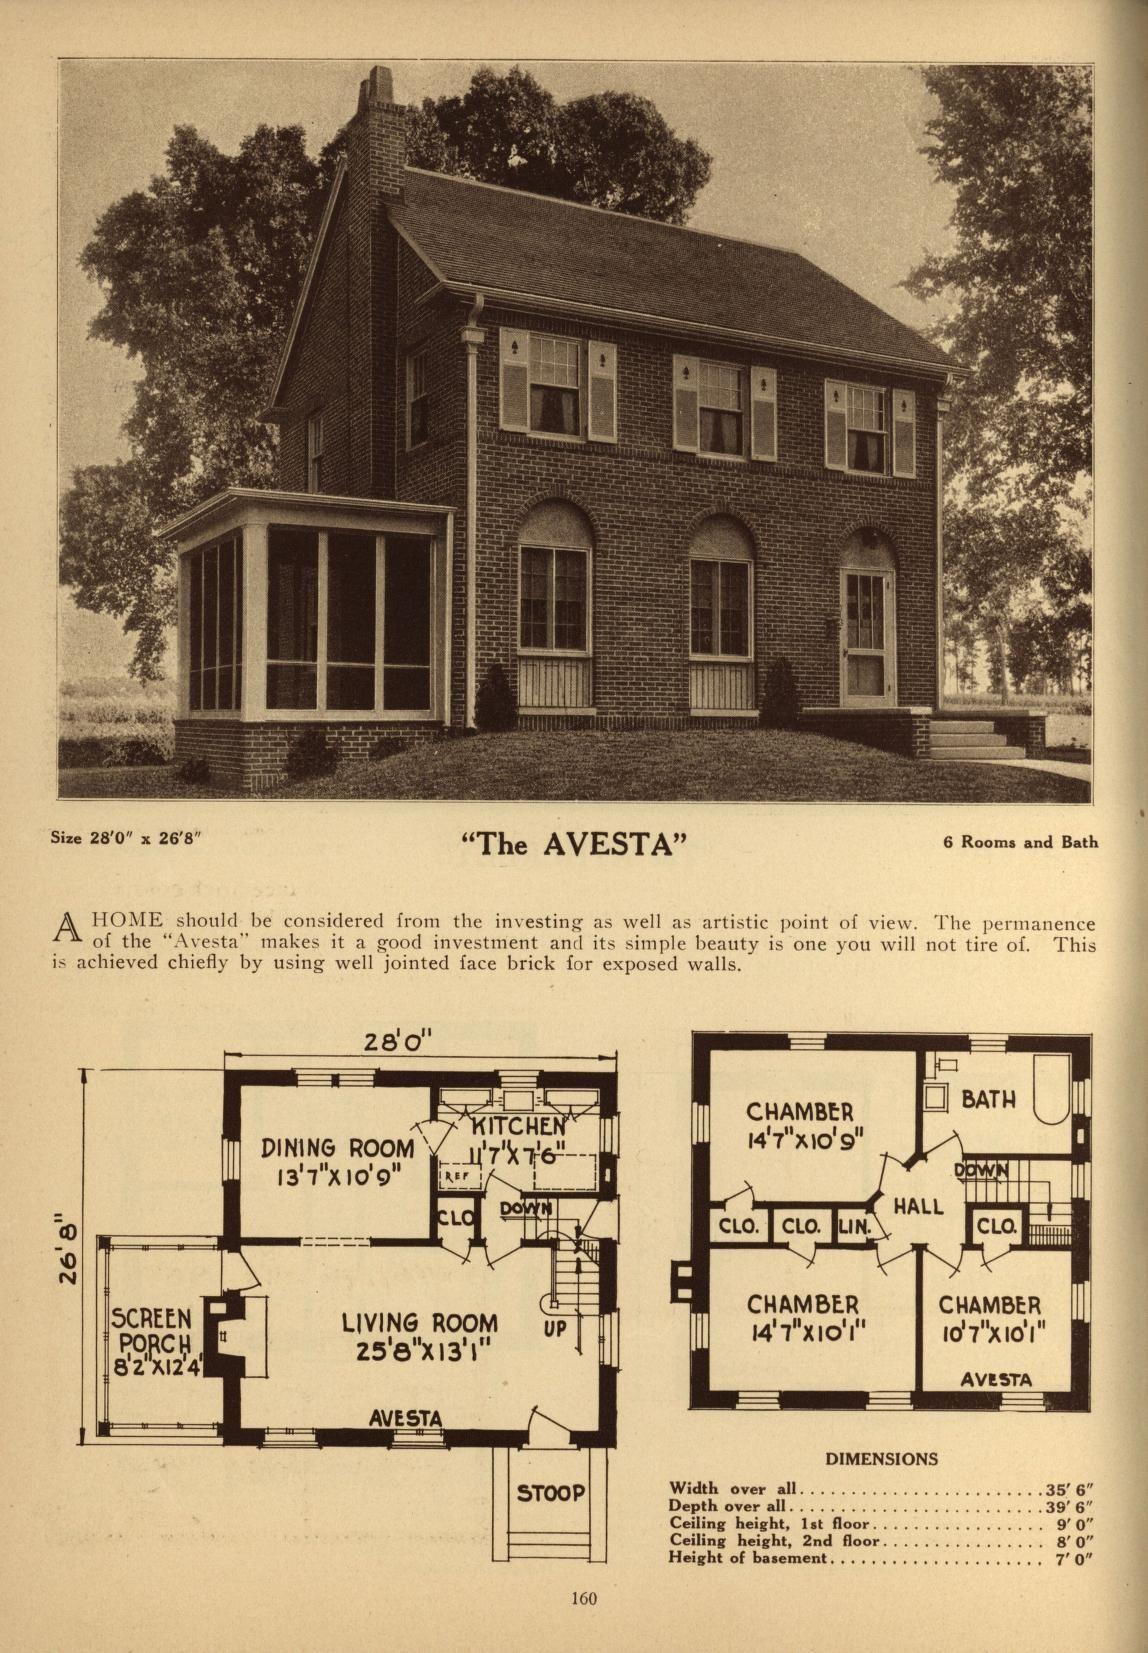 Deyo S Book Of Homes Vintage House Plans House Floor Plans Vintage House